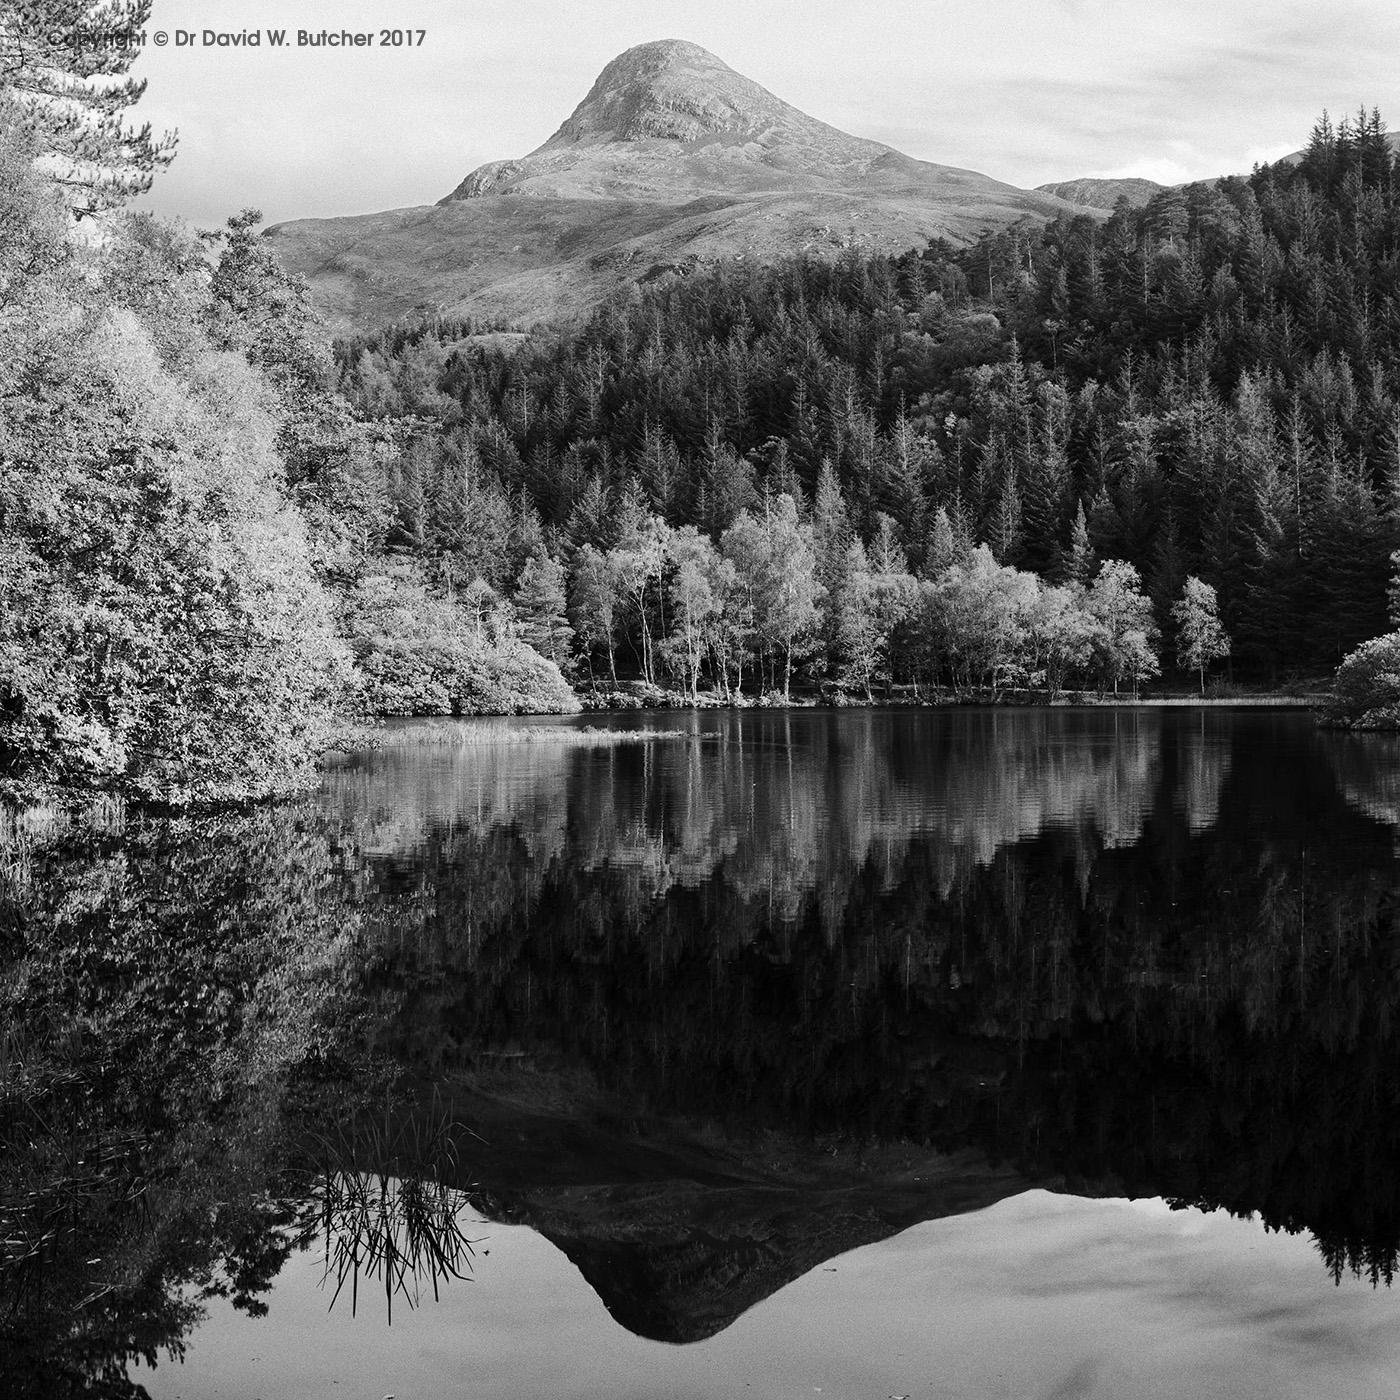 Glencoe Lochan Reflections, Scotland